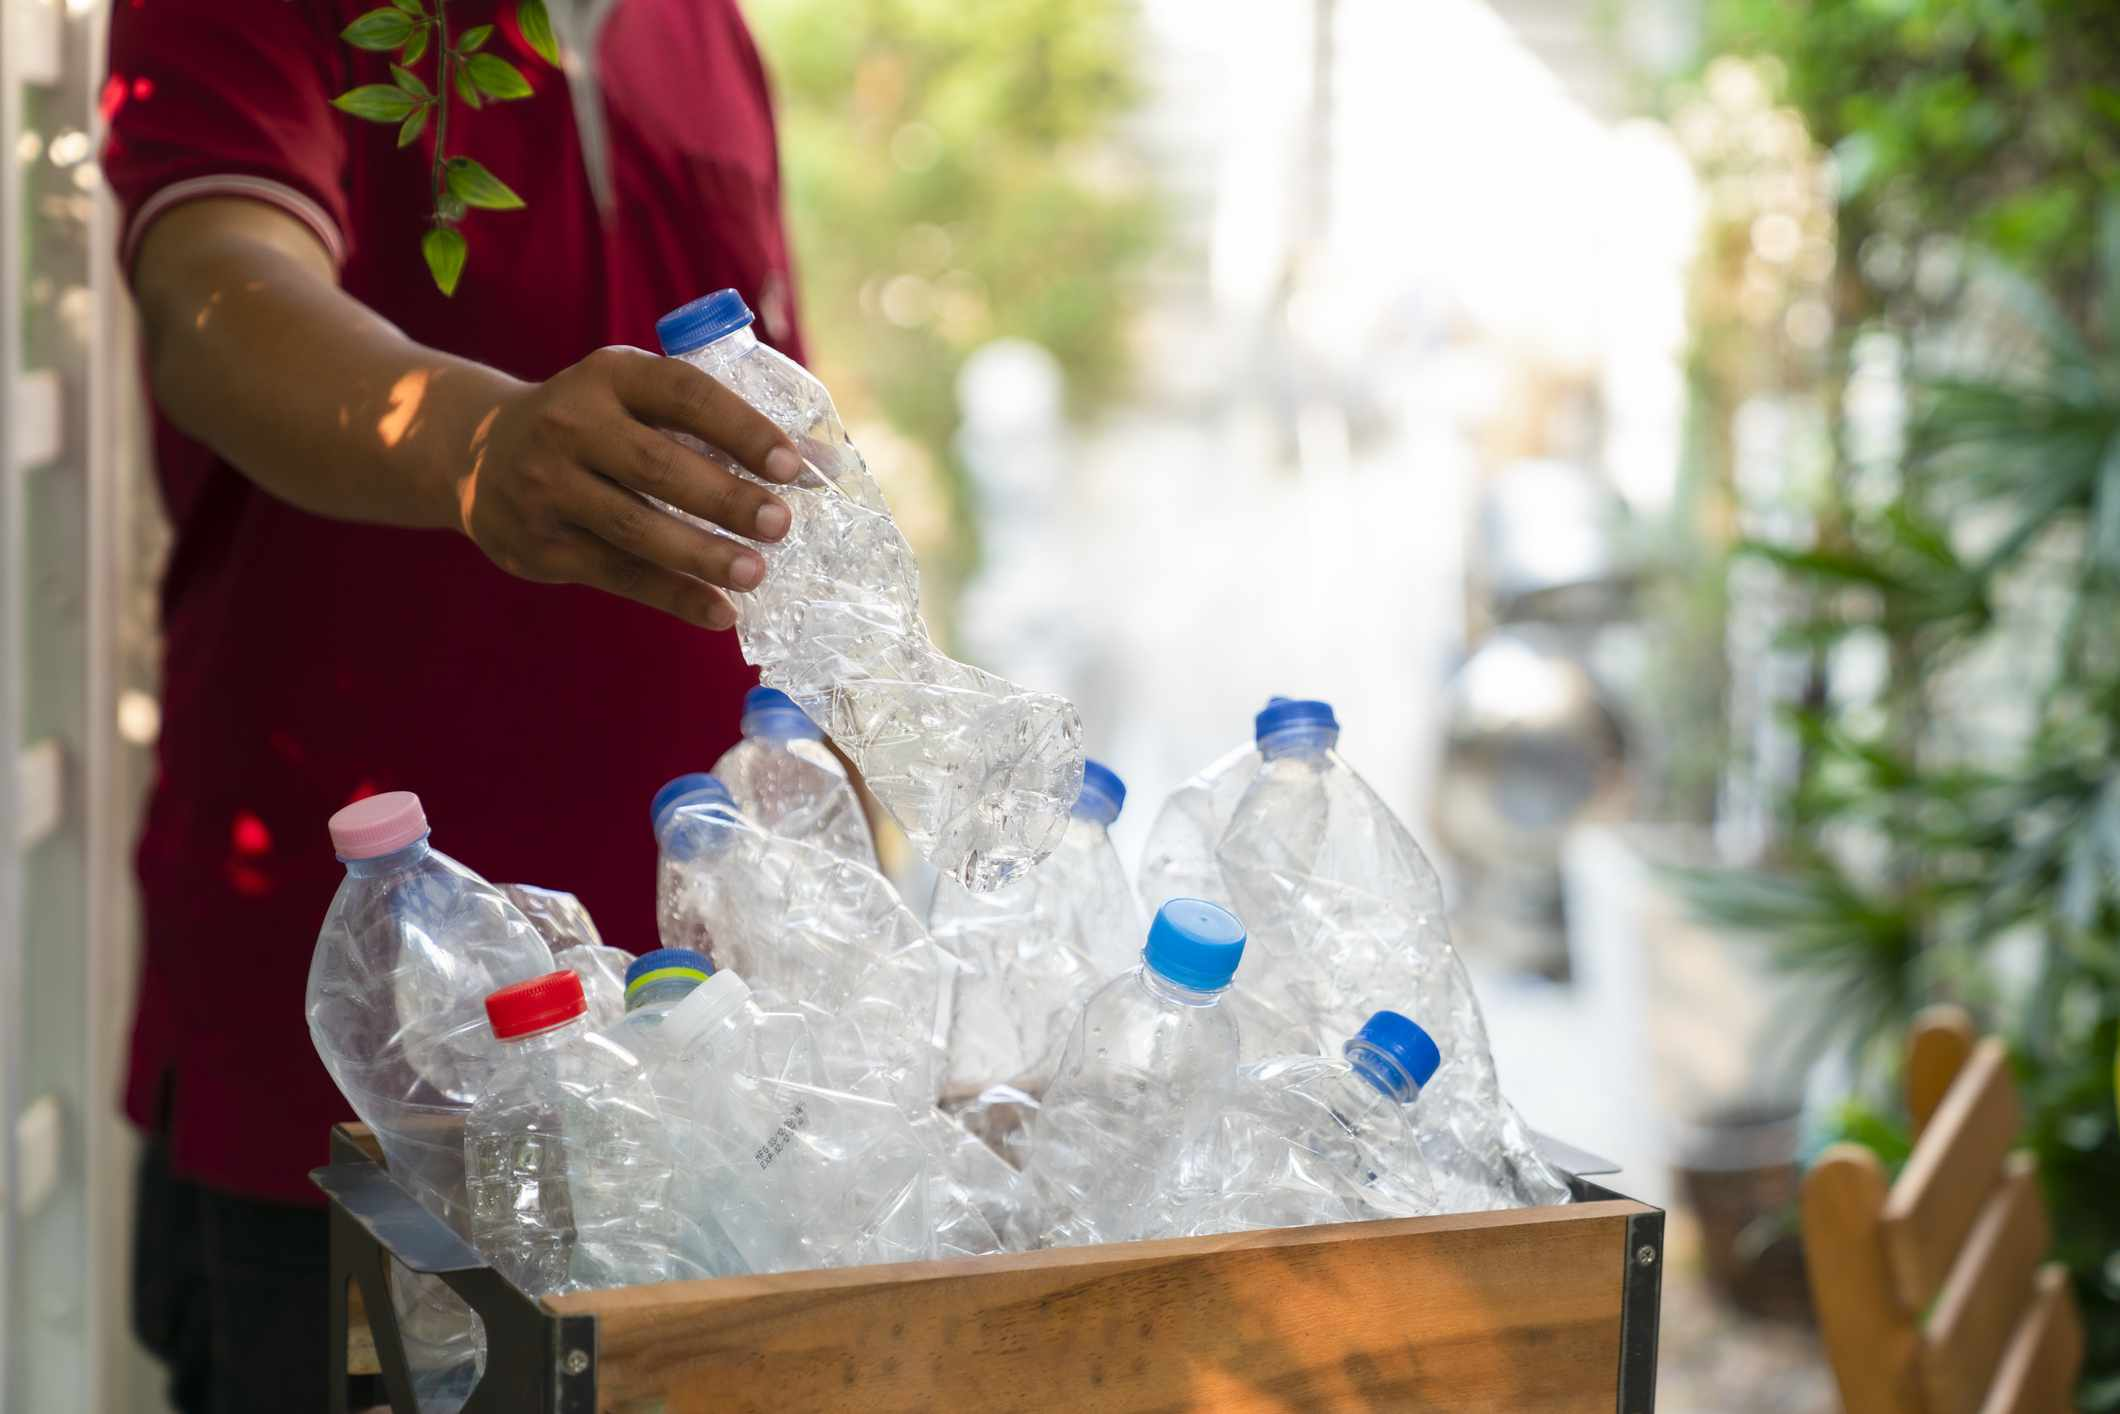 A man putting plastic bottles in a bin.